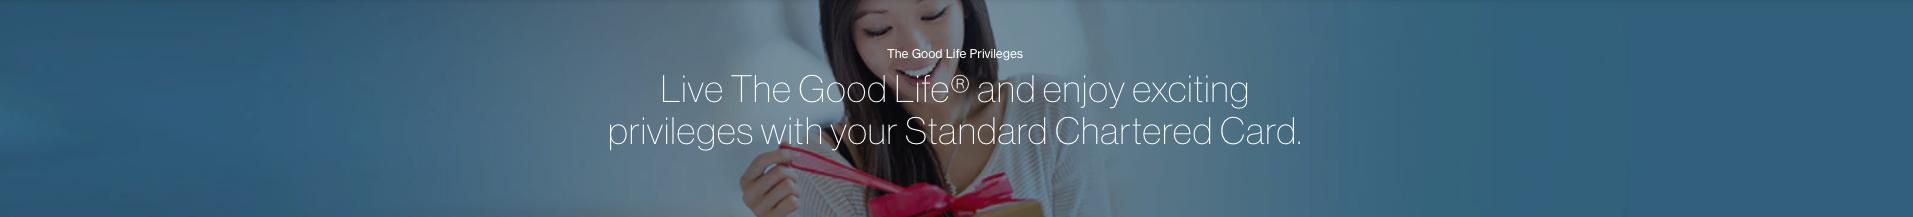 Standard Chartered September promotions